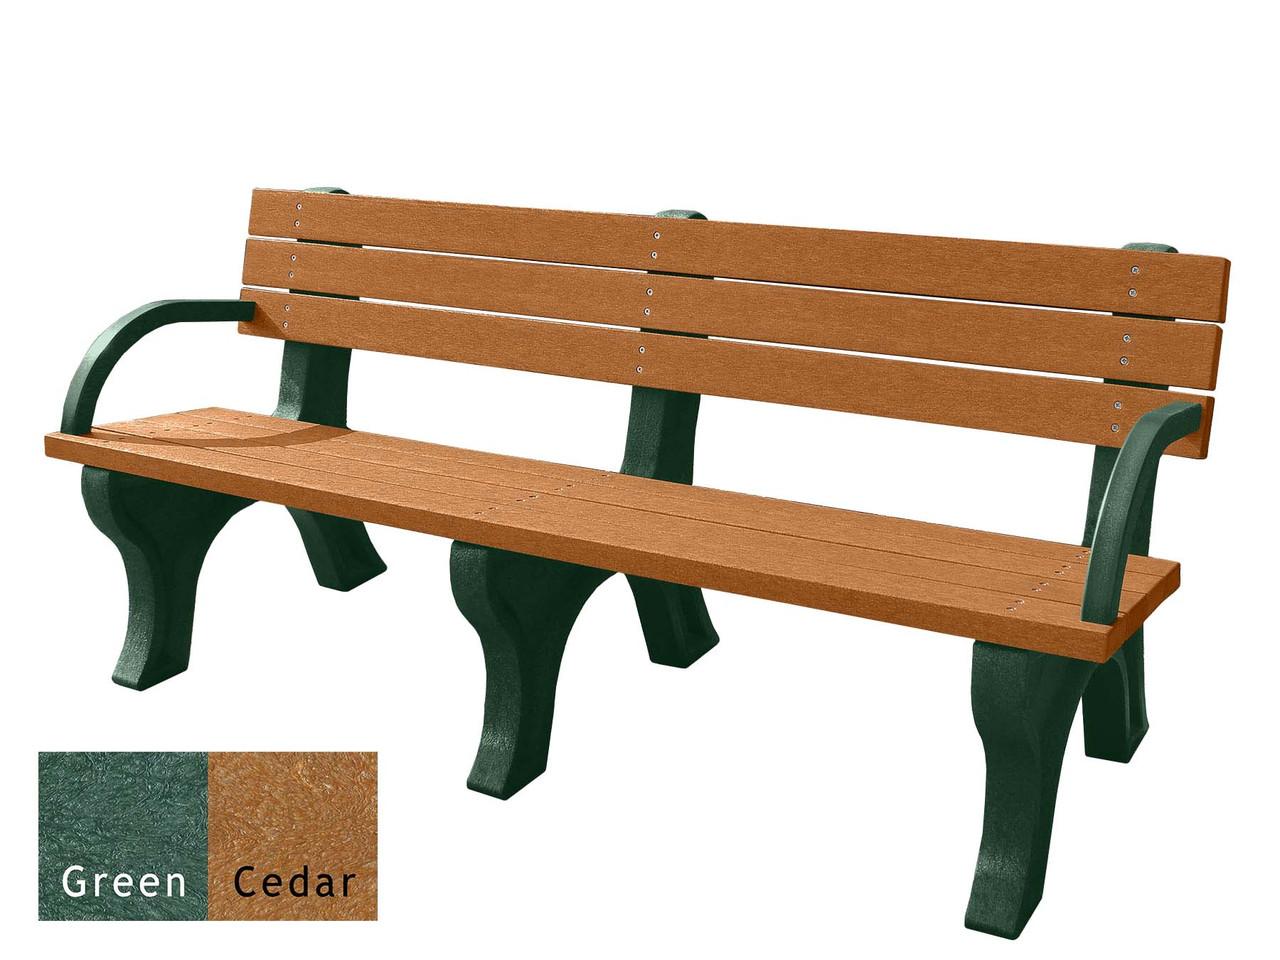 Green and Cedar